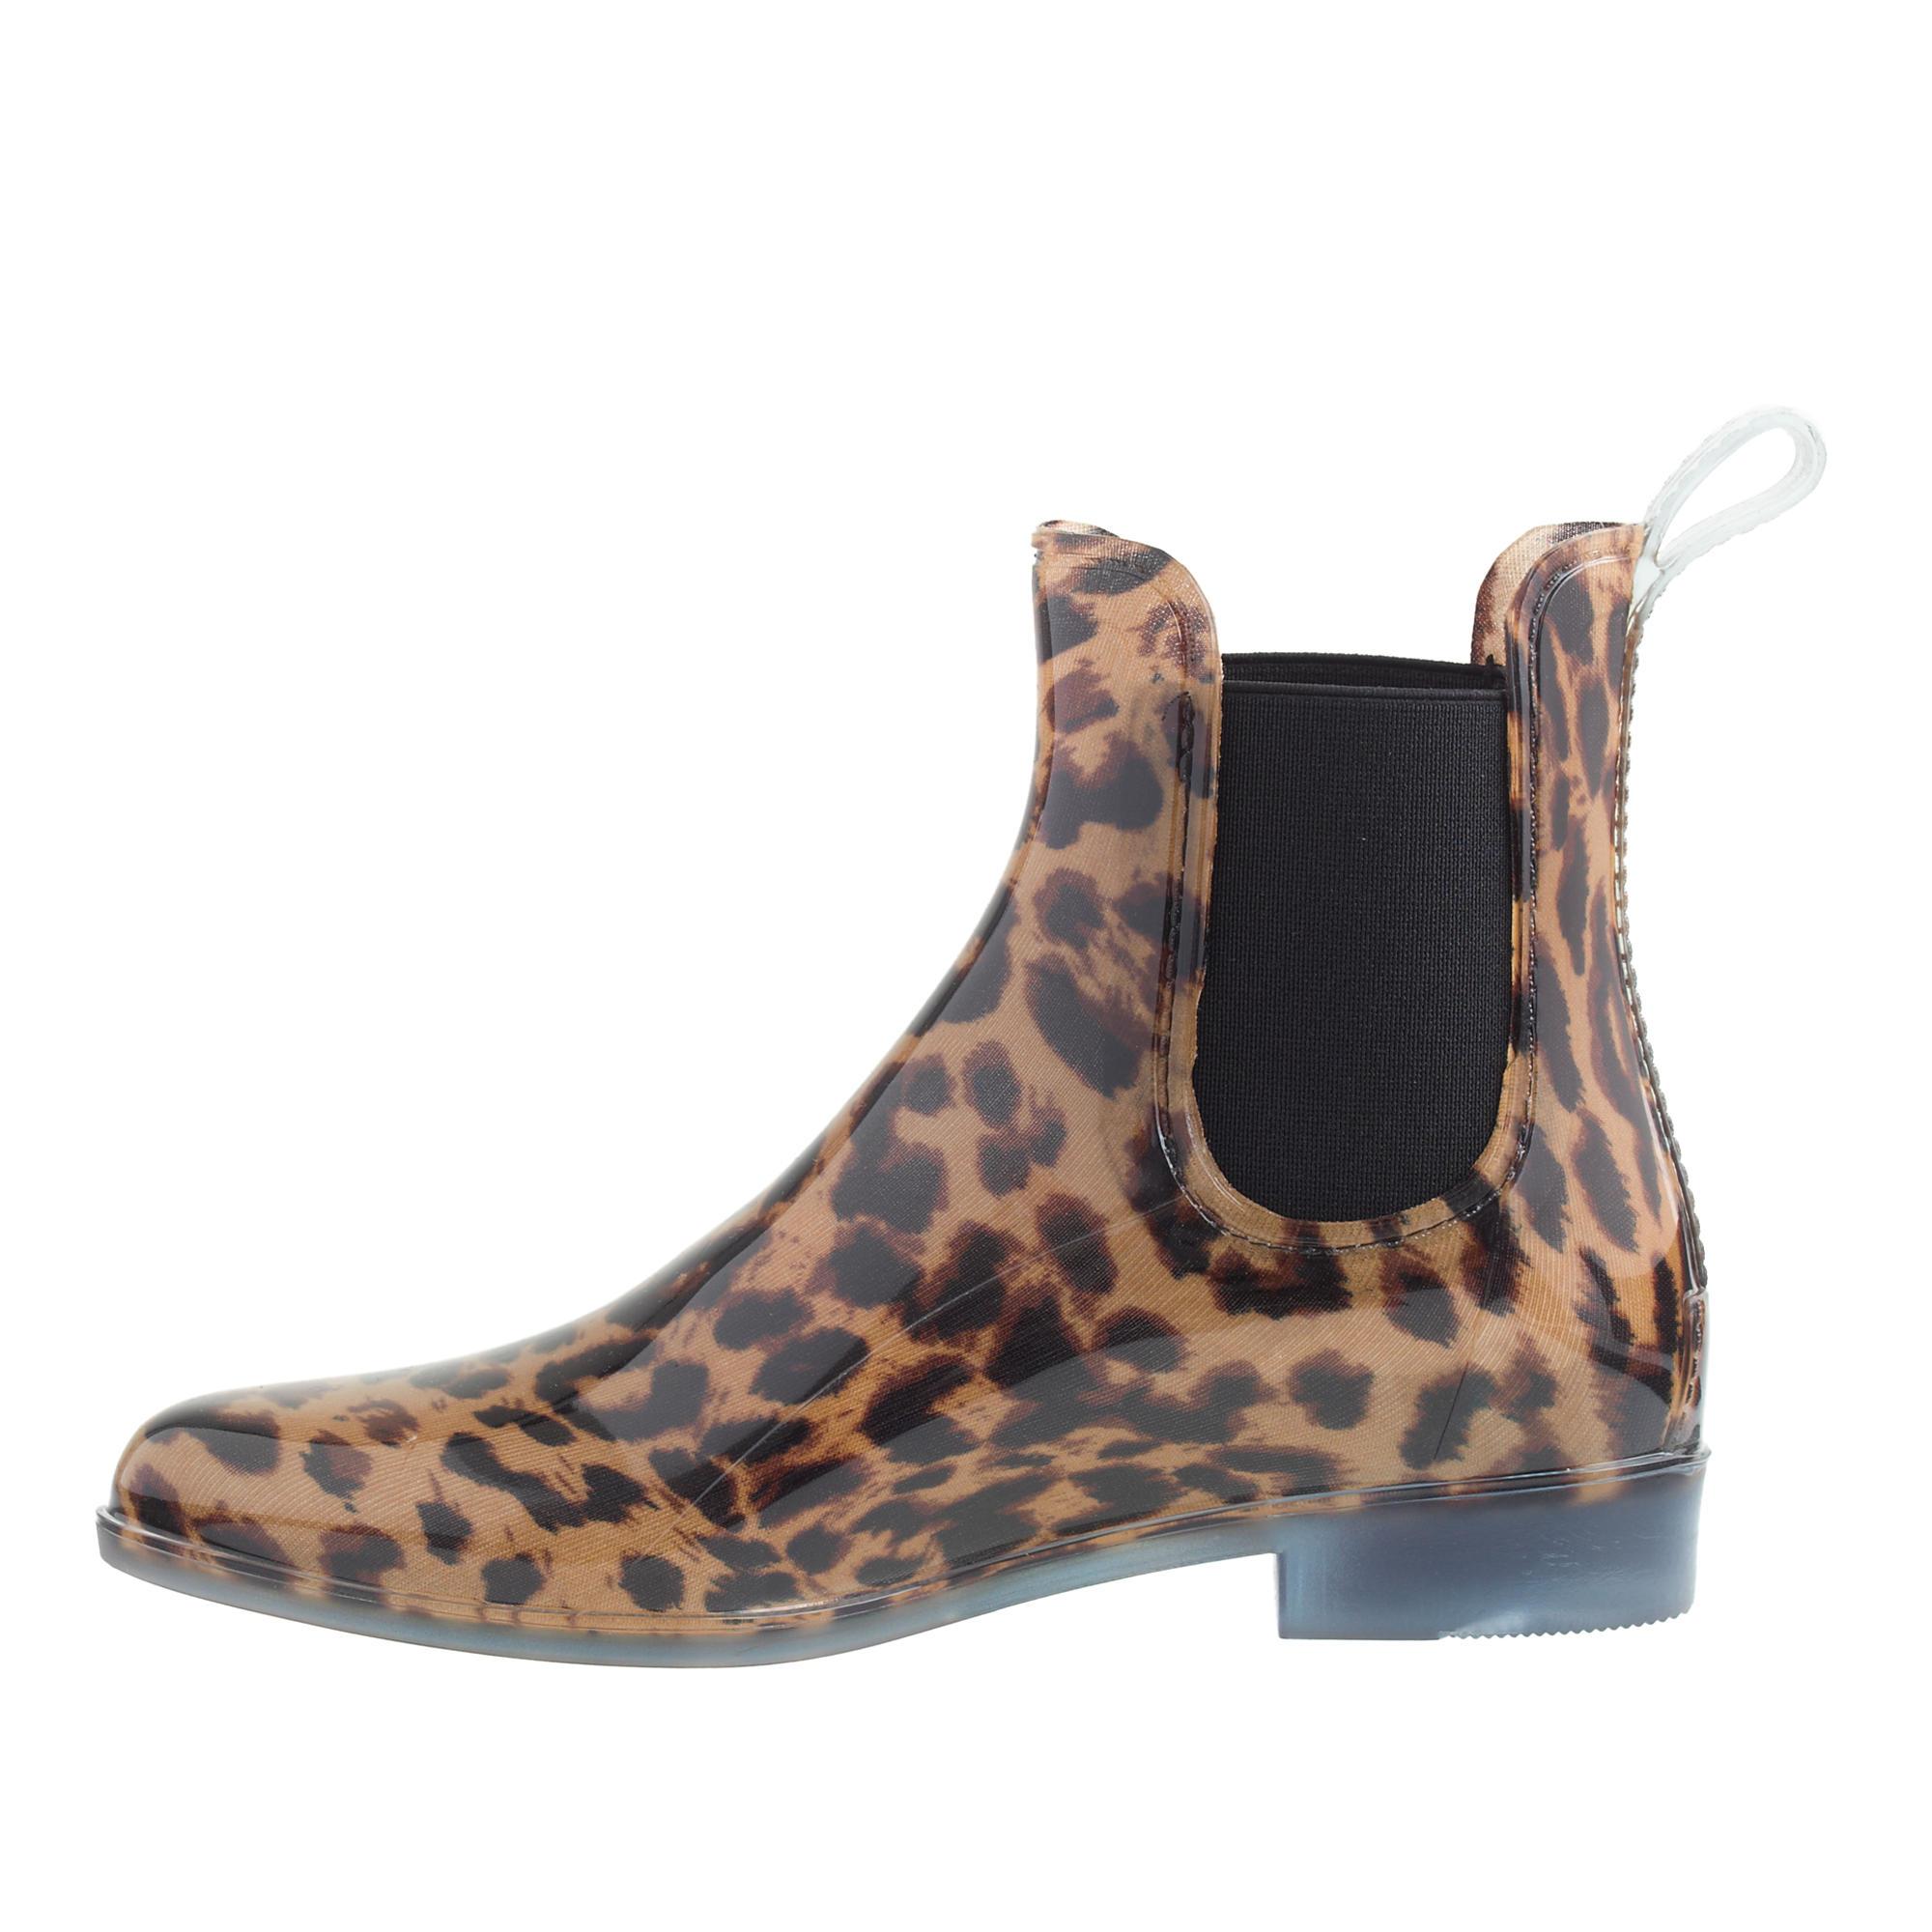 cd4033cfa163 J.Crew Chelsea Leopard Rain Boots - Lyst